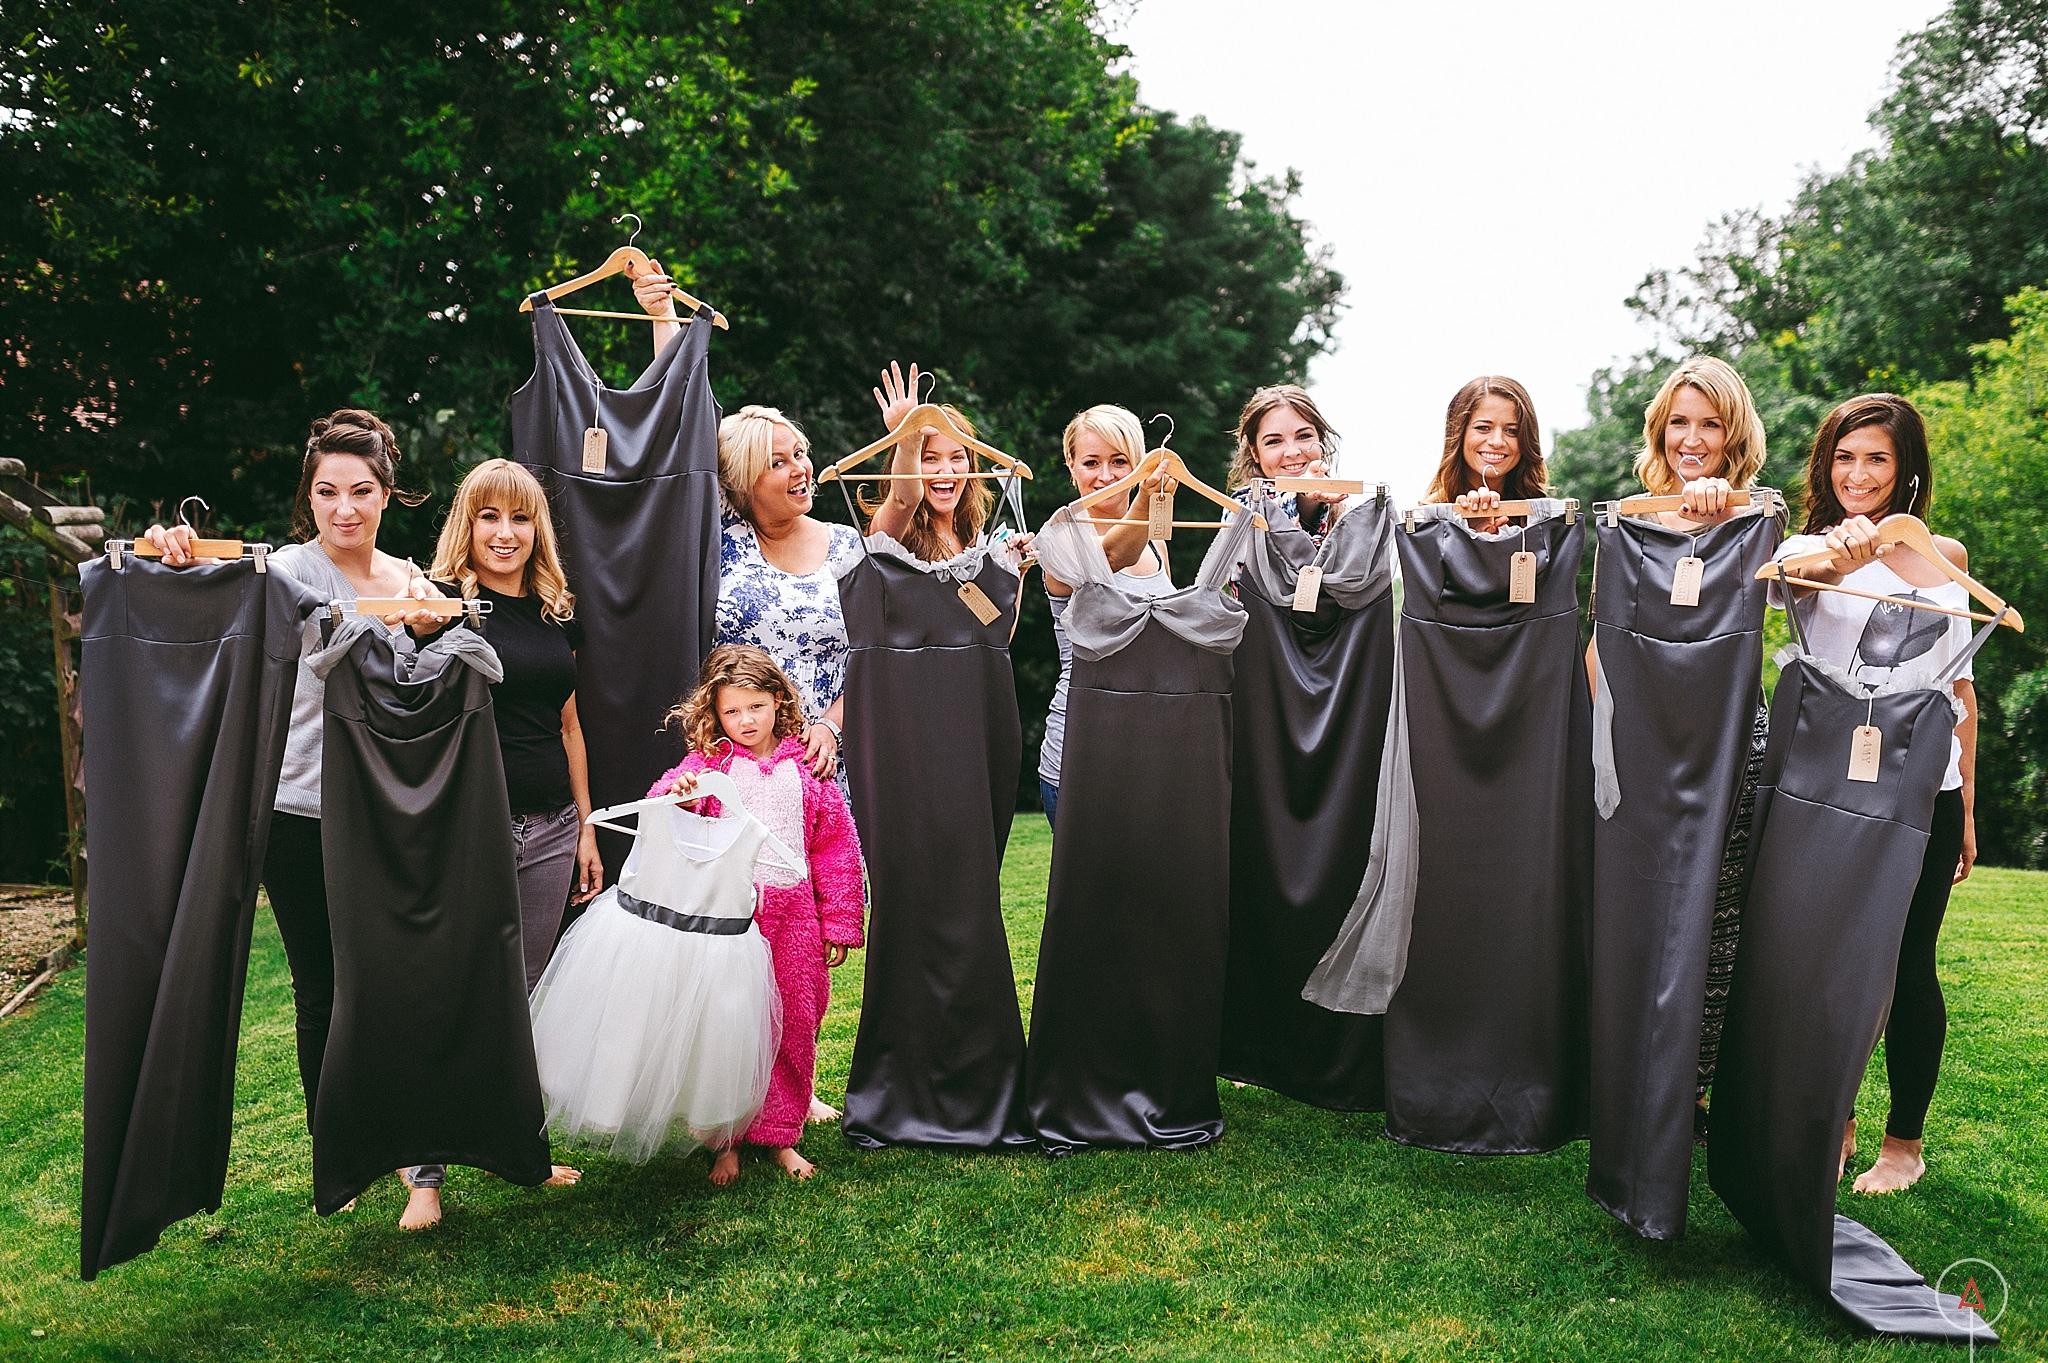 cardiff-wedding-photographer-aga-tomaszek_0346